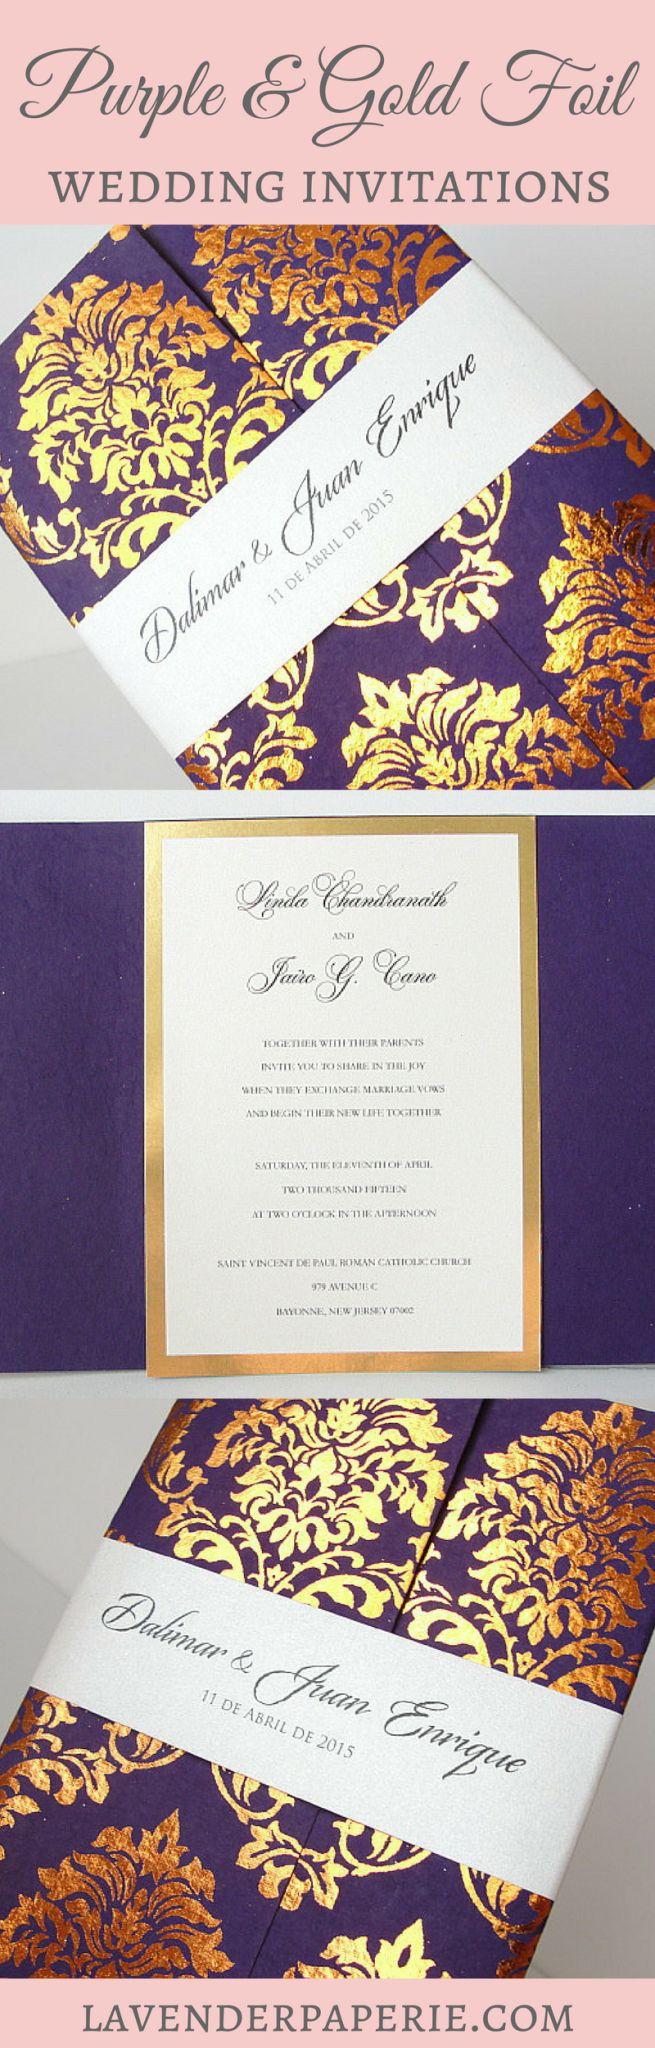 38 best Wedding Flowers Purple images on Pinterest | Wedding ...